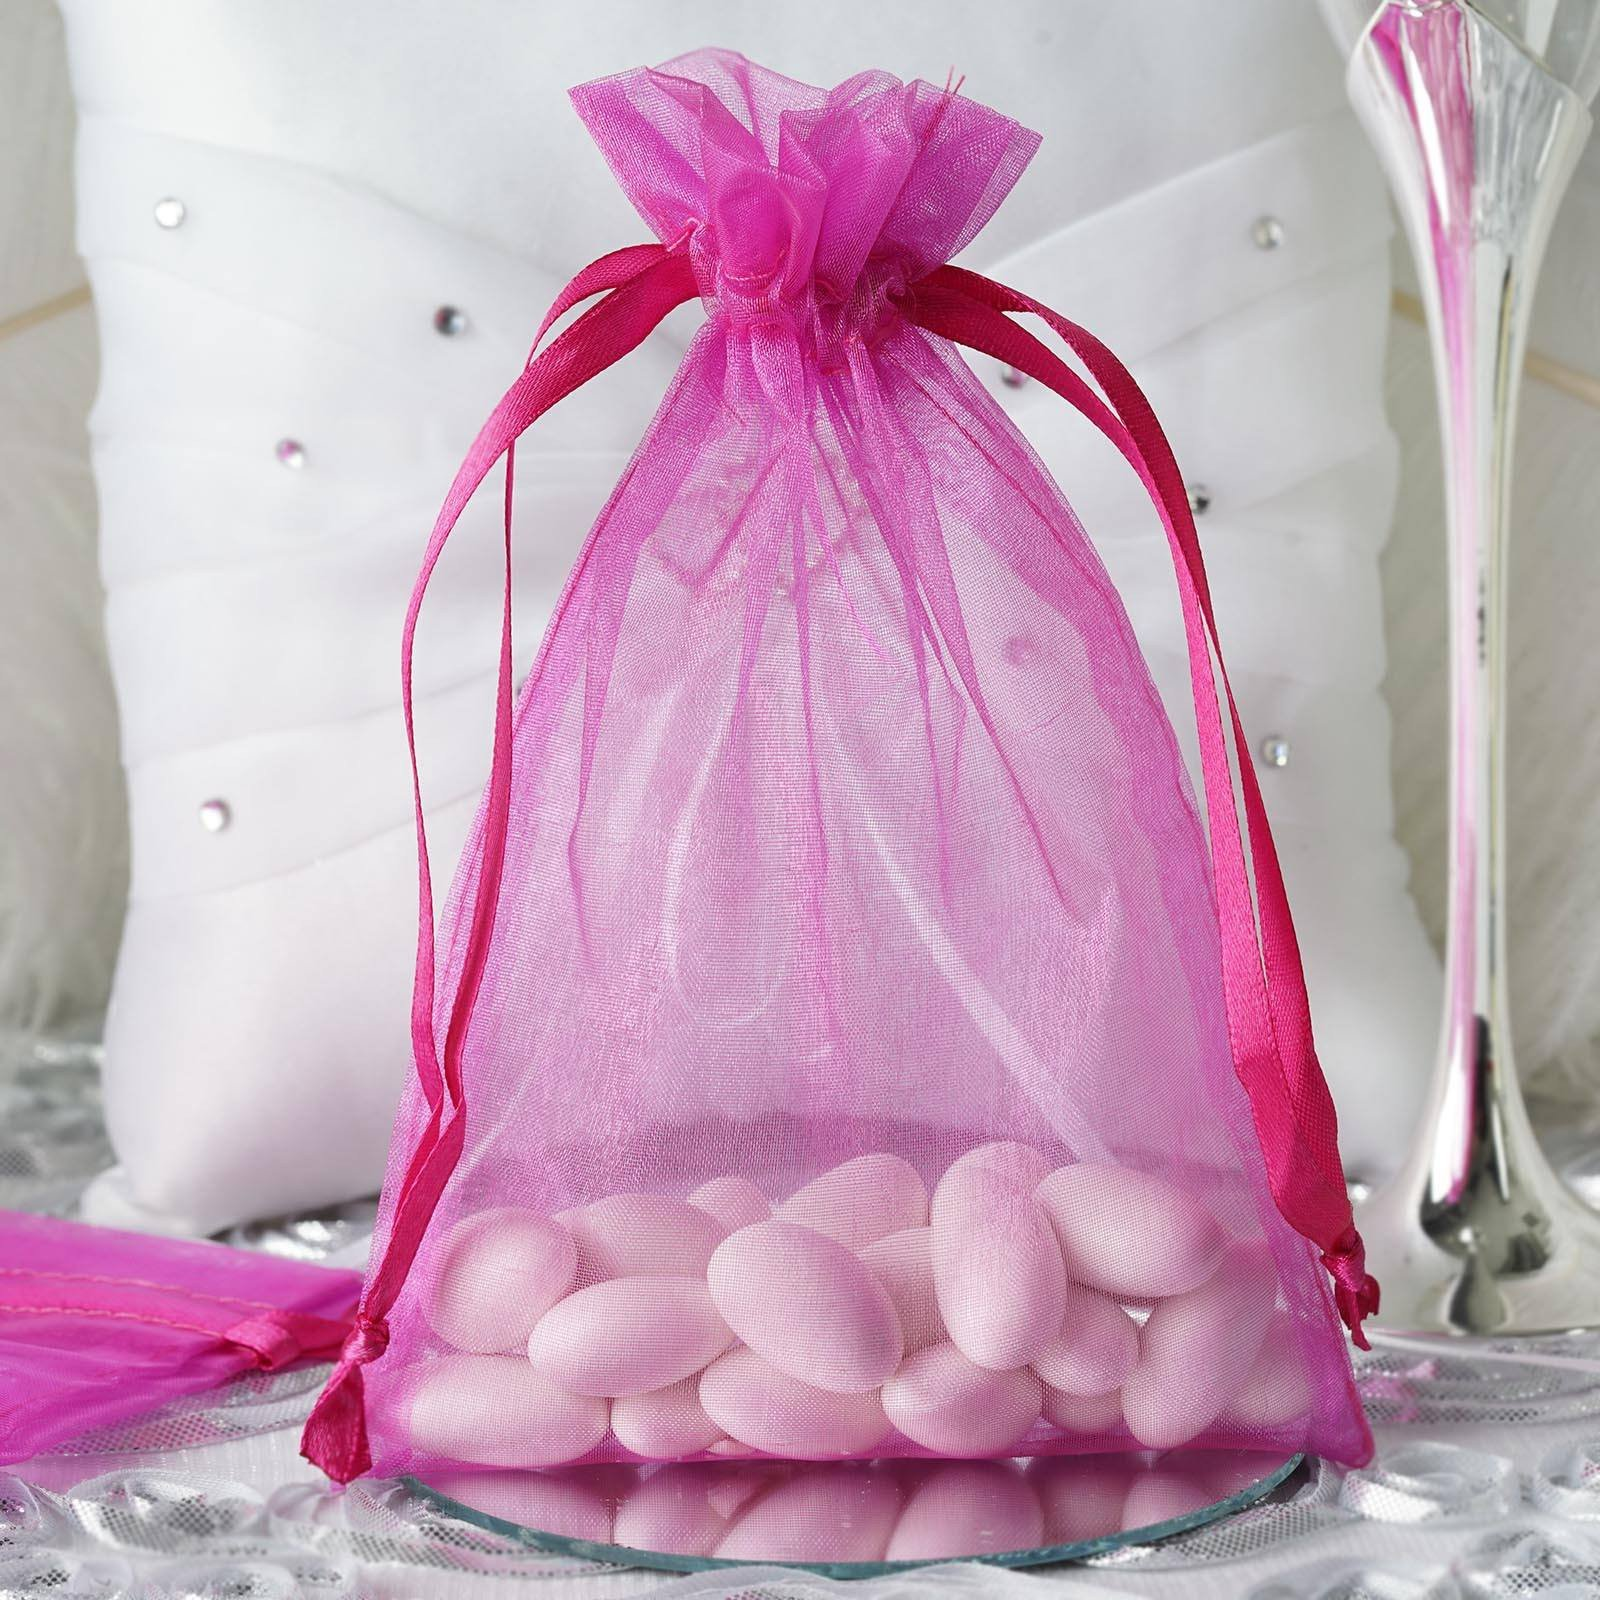 Wedding Gifts At Walmart: Efavormart 10PCS Organza Gift Bag Drawstring Pouch For